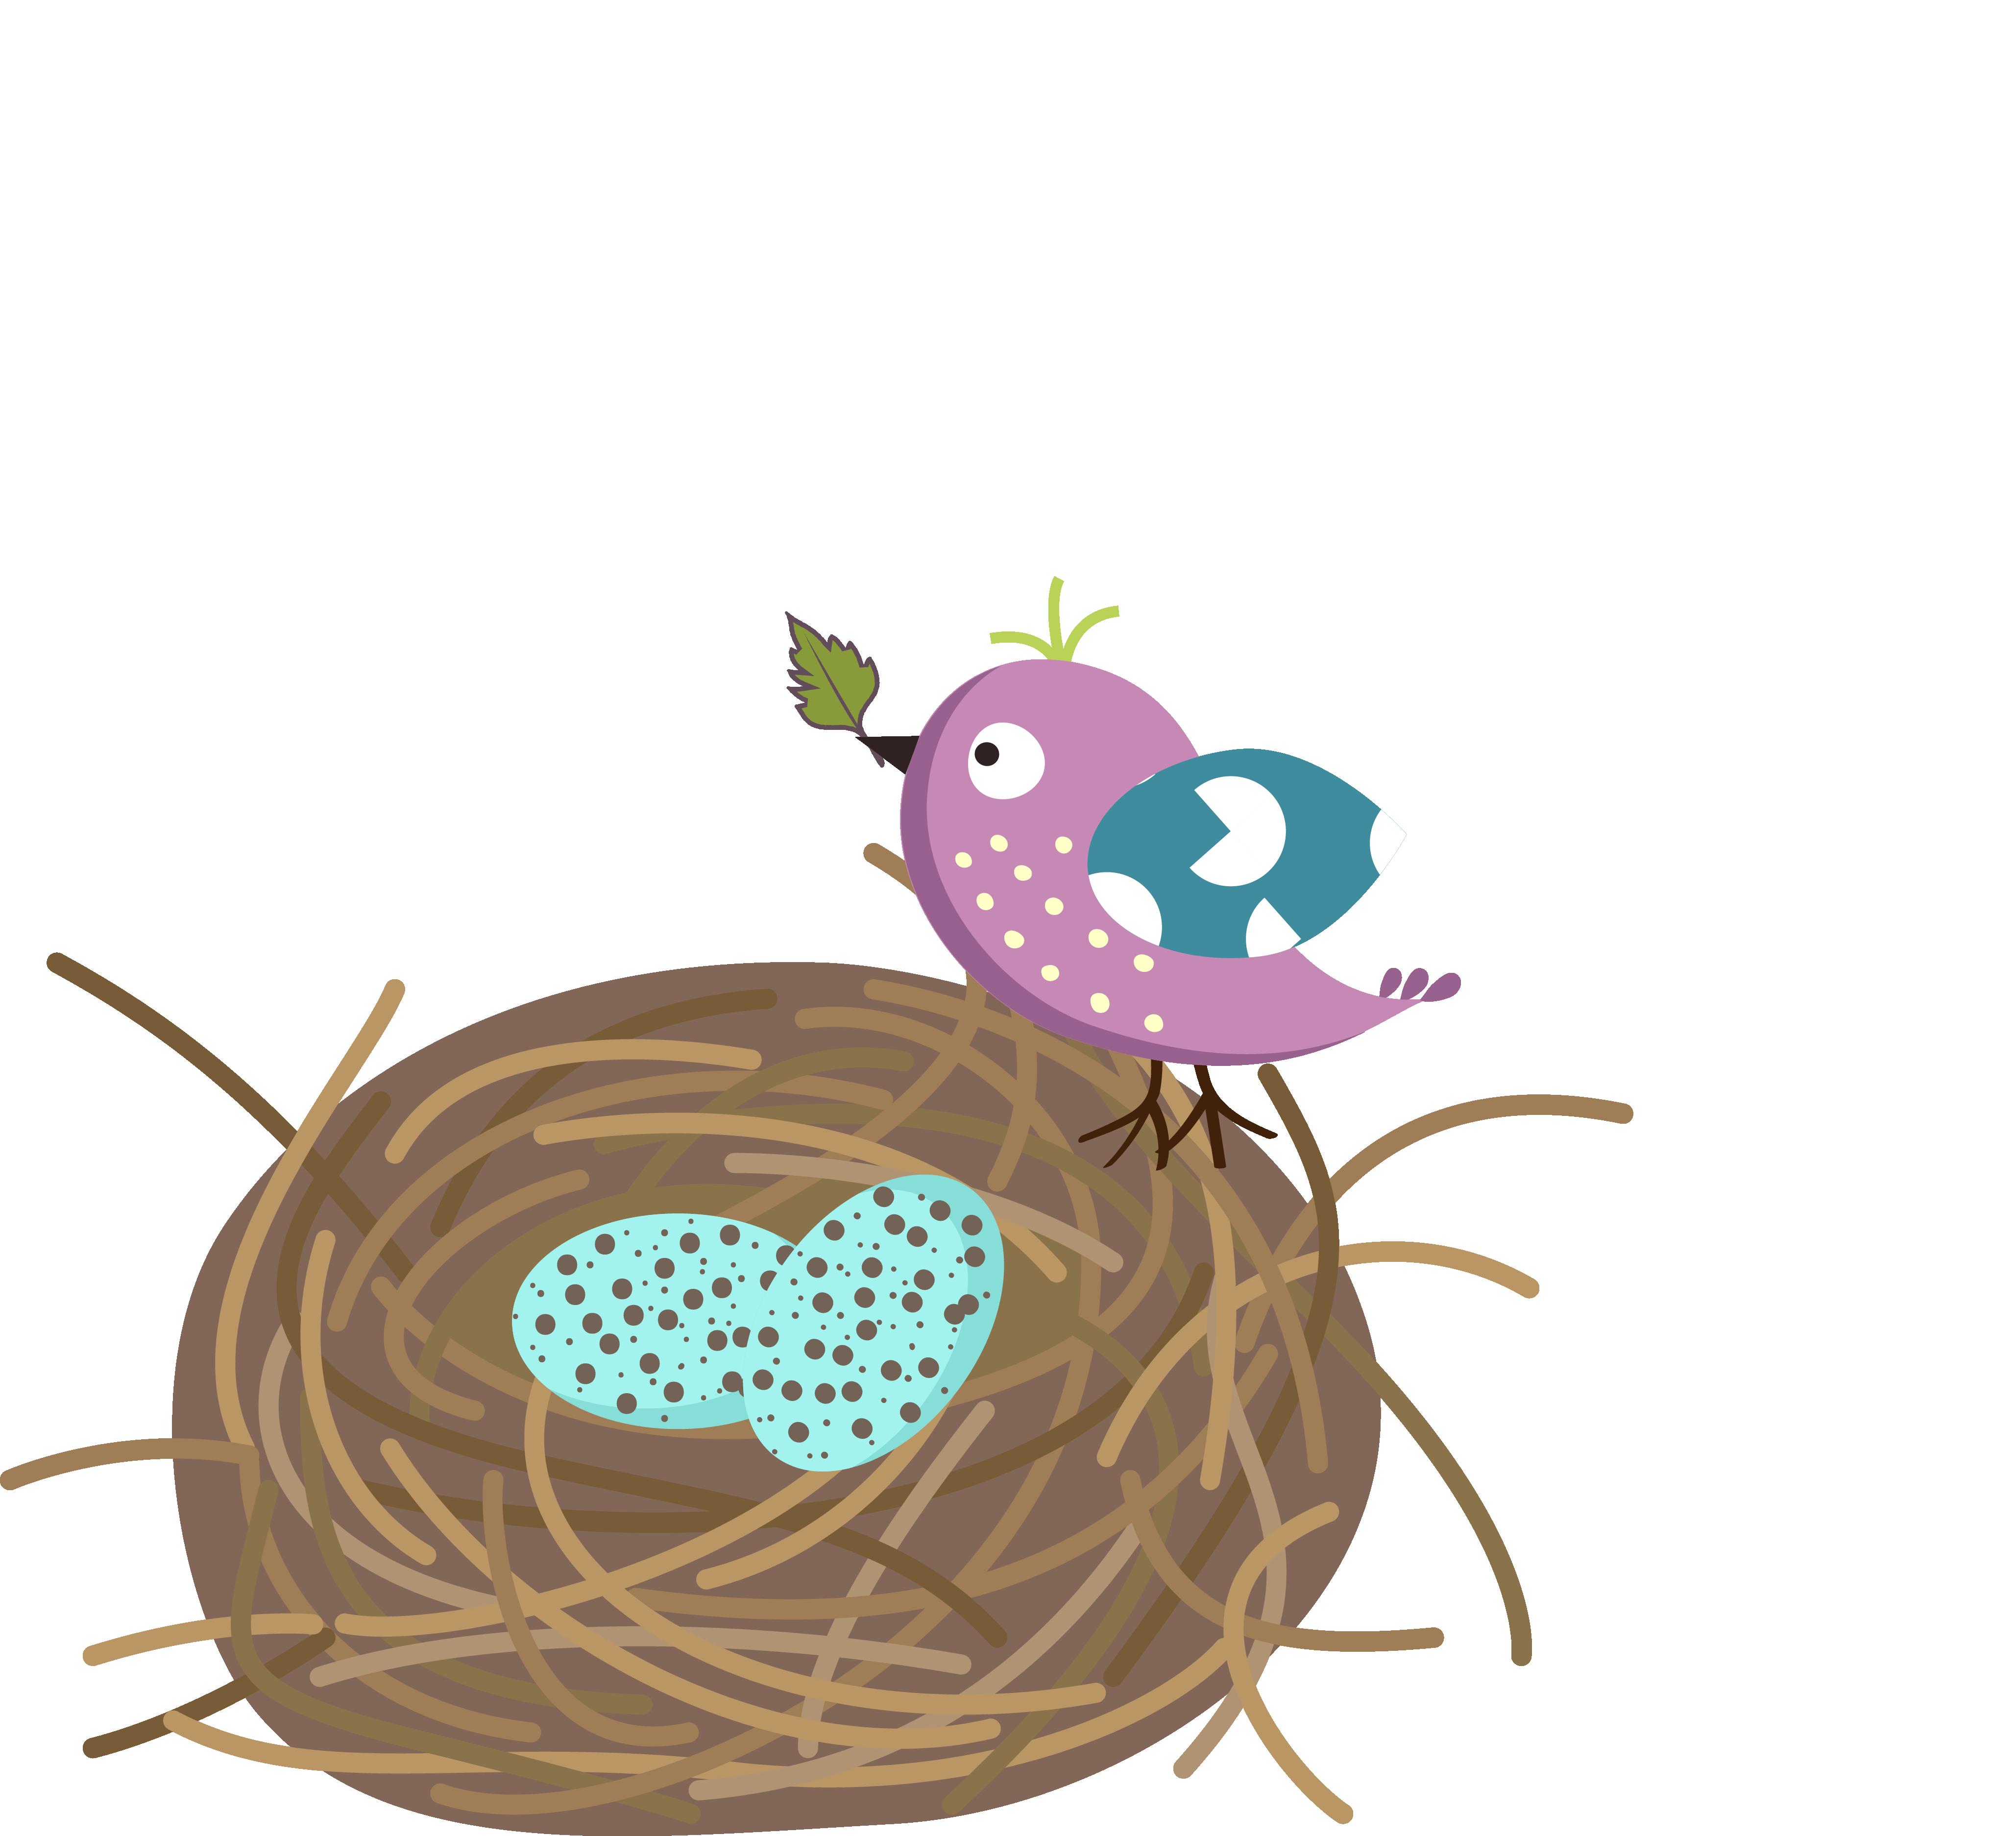 4115x3748 Unconditional Bird Nest Cartoon With Eggs Clip Art Sweet